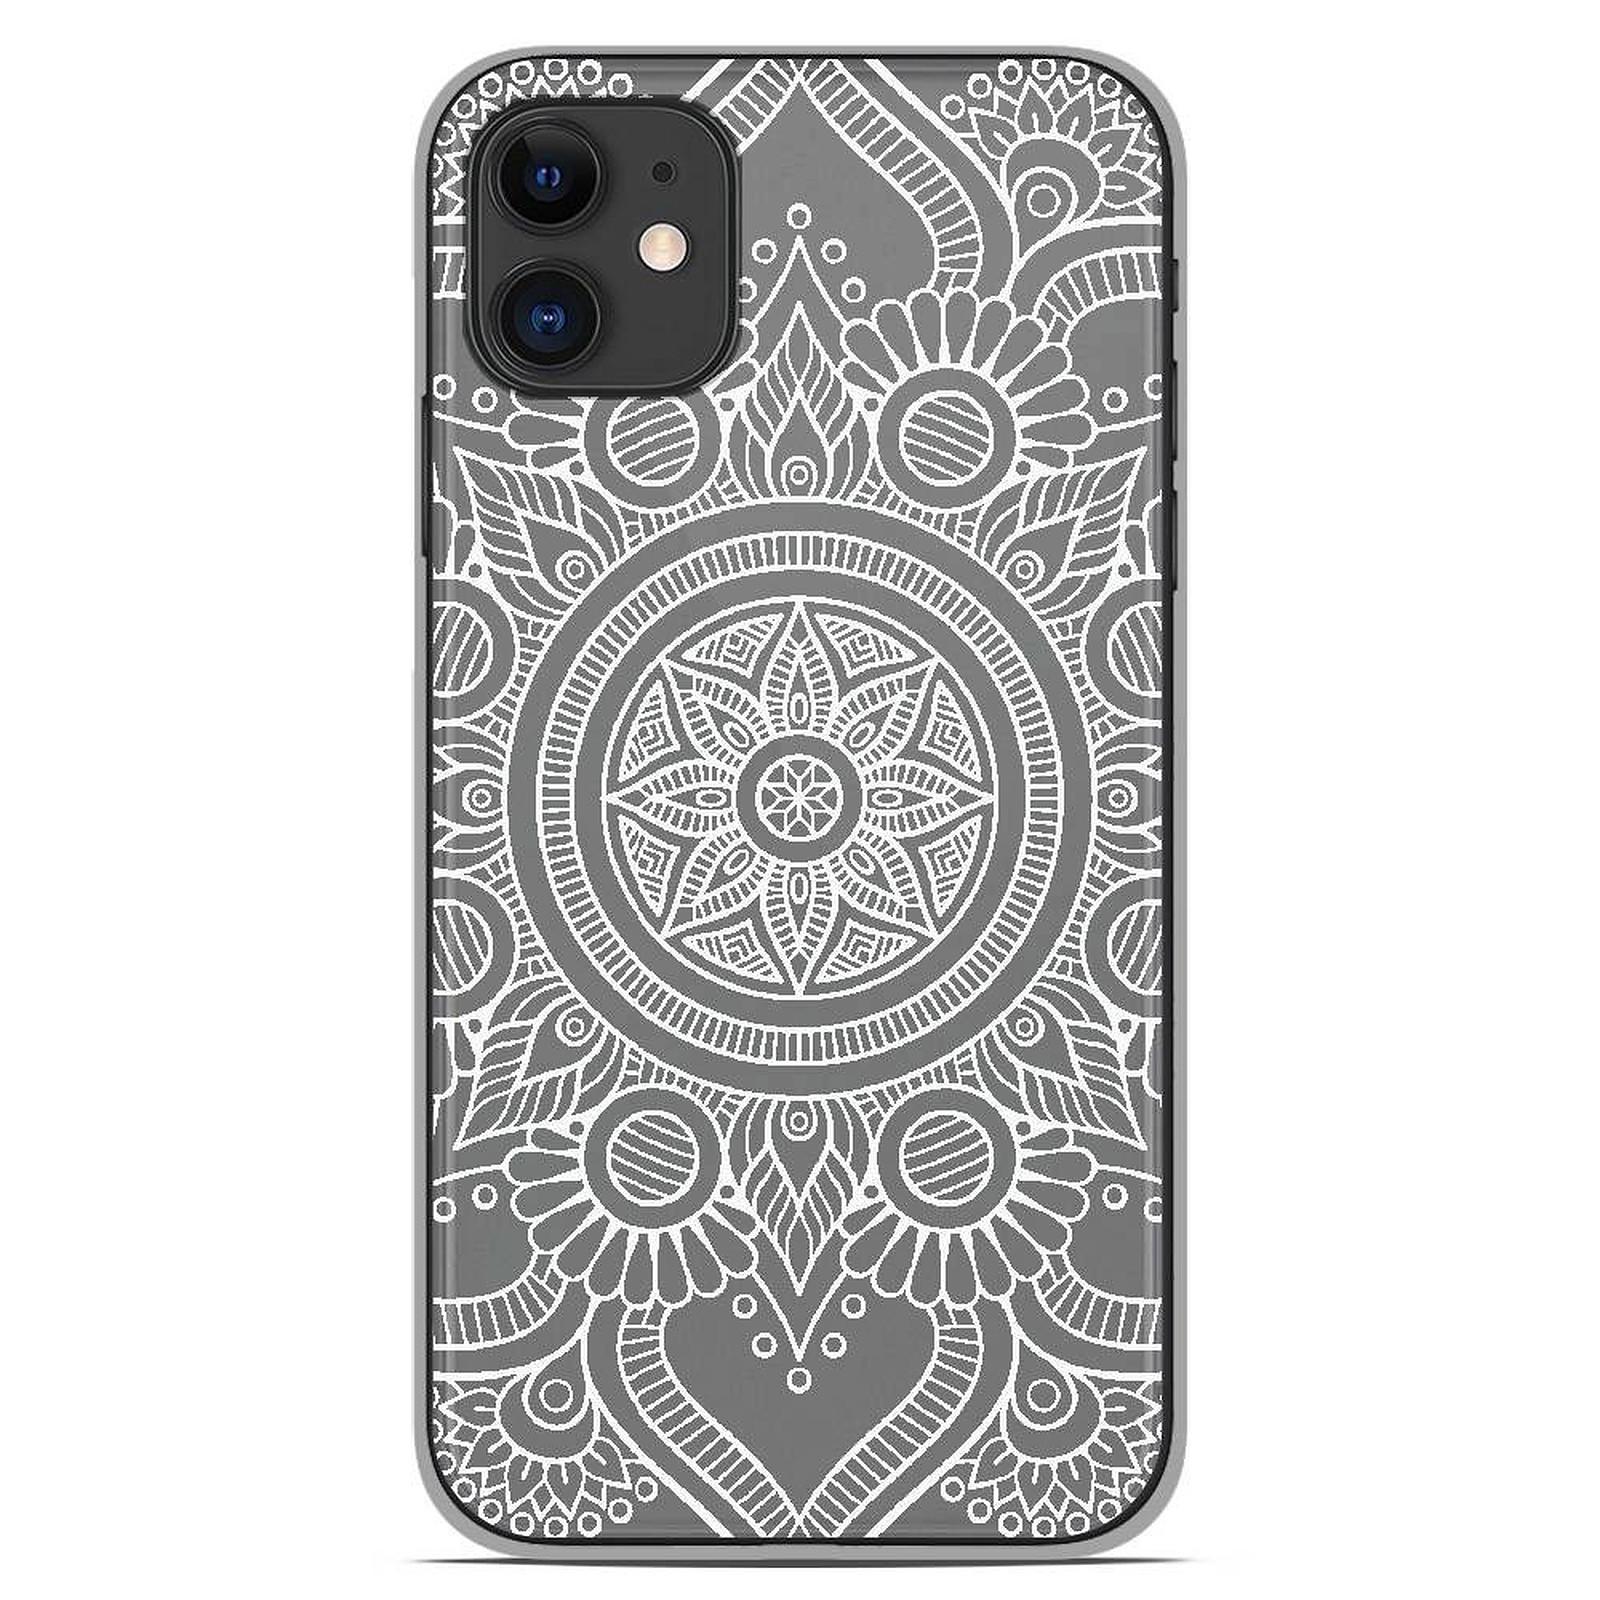 1001 Coques Coque silicone gel Apple iPhone 11 motif Mandala blanc - Coque téléphone 1001Coques sur LDLC